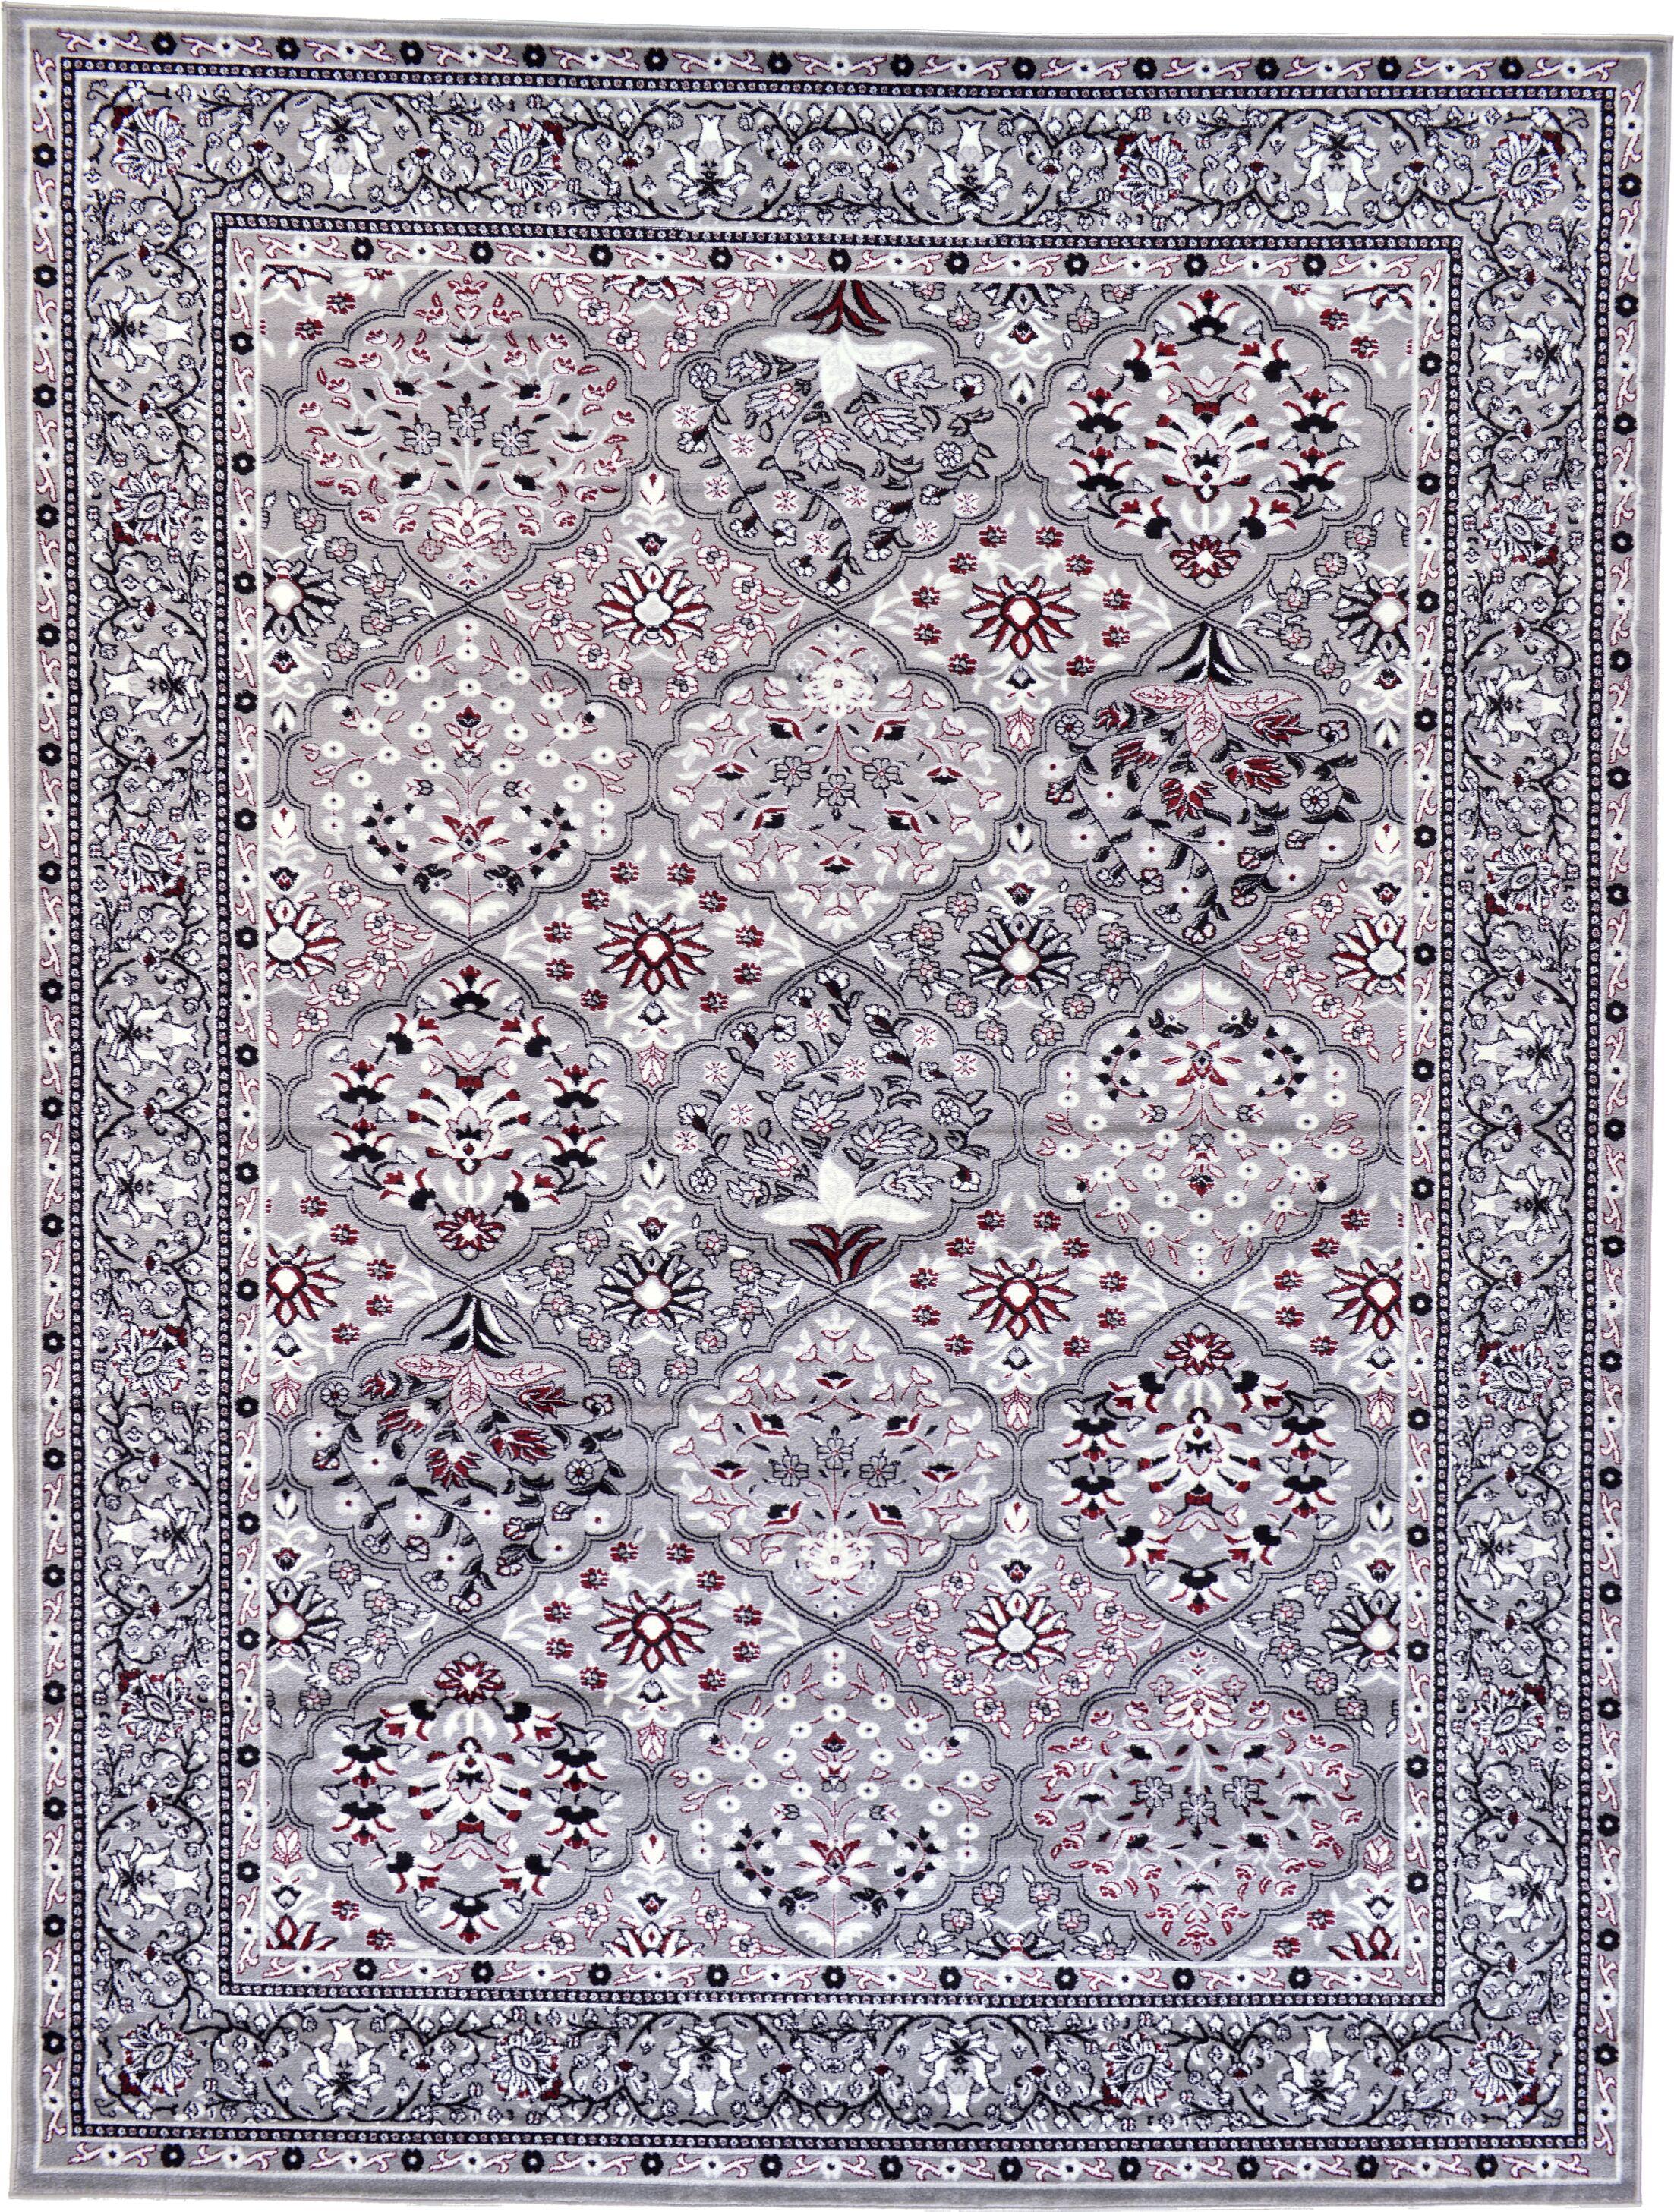 Janiyah Light Gray/Black Area Rug Rug Size: Rectangle 9'10